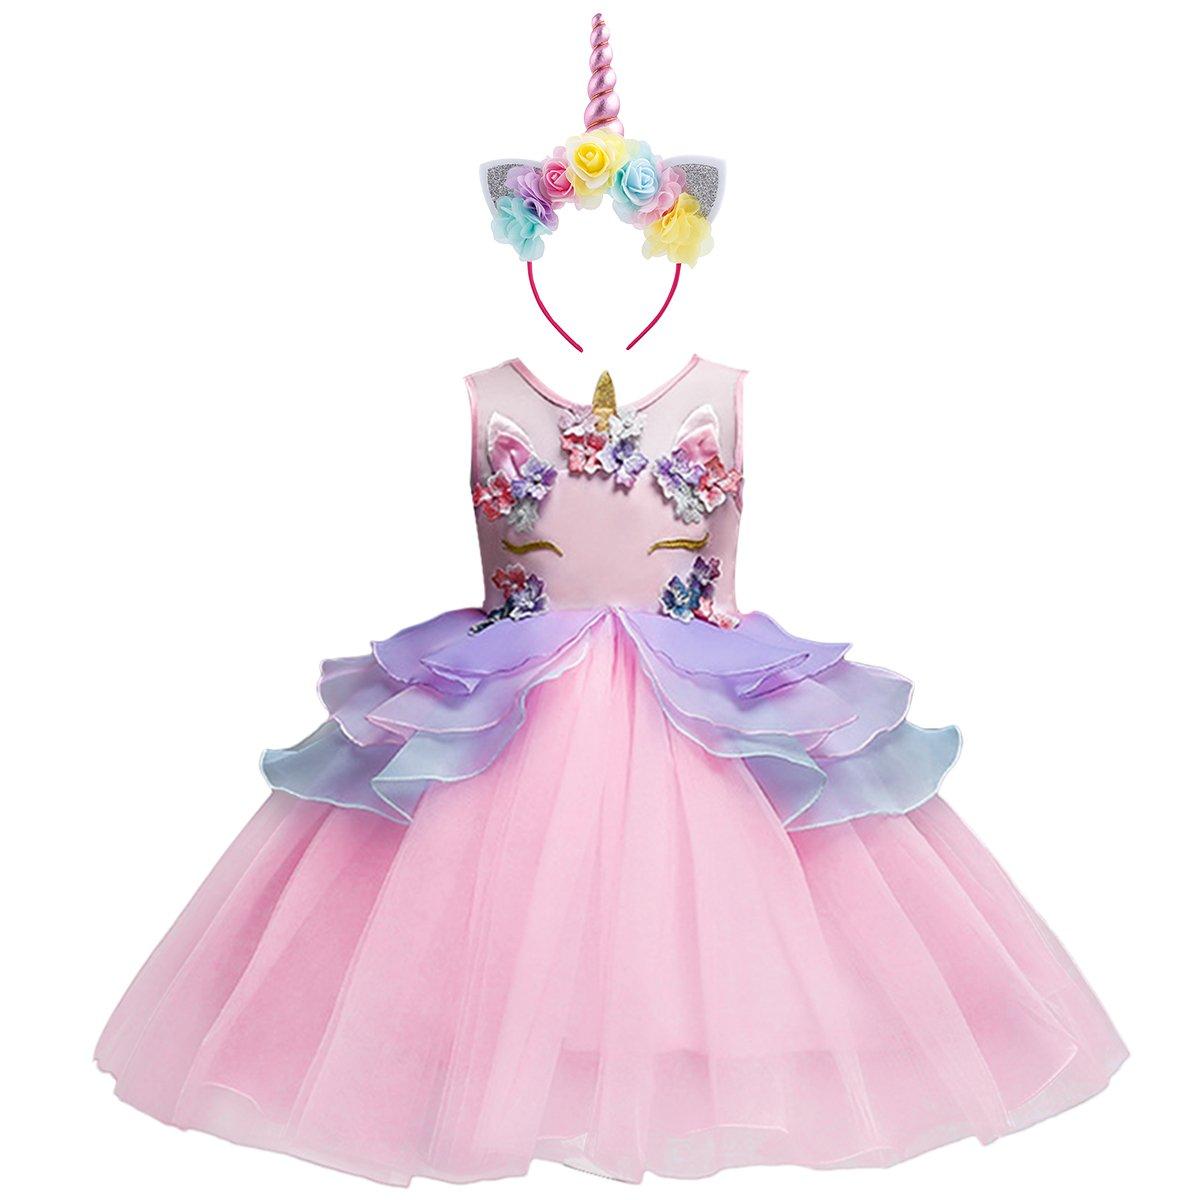 Baby Kids Girls Toddler Unicorn Dress Sleeveless Princess Tulle Dress Wedding Birthday Party Gown Performance Costume S# Pink 4-5 Years